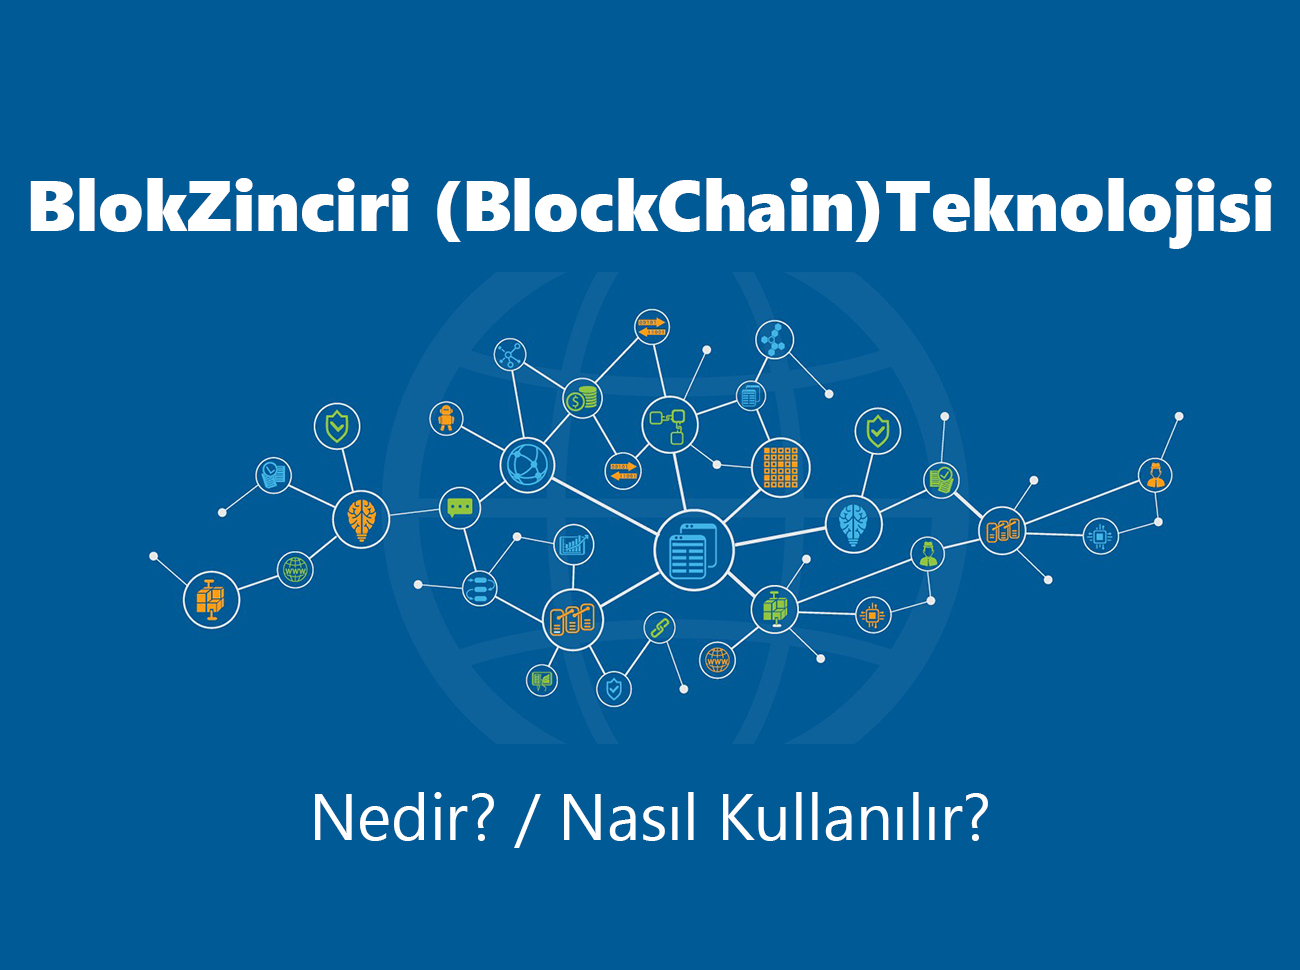 Blokzinciri (Blockchain) Teknolojisi Nedir?